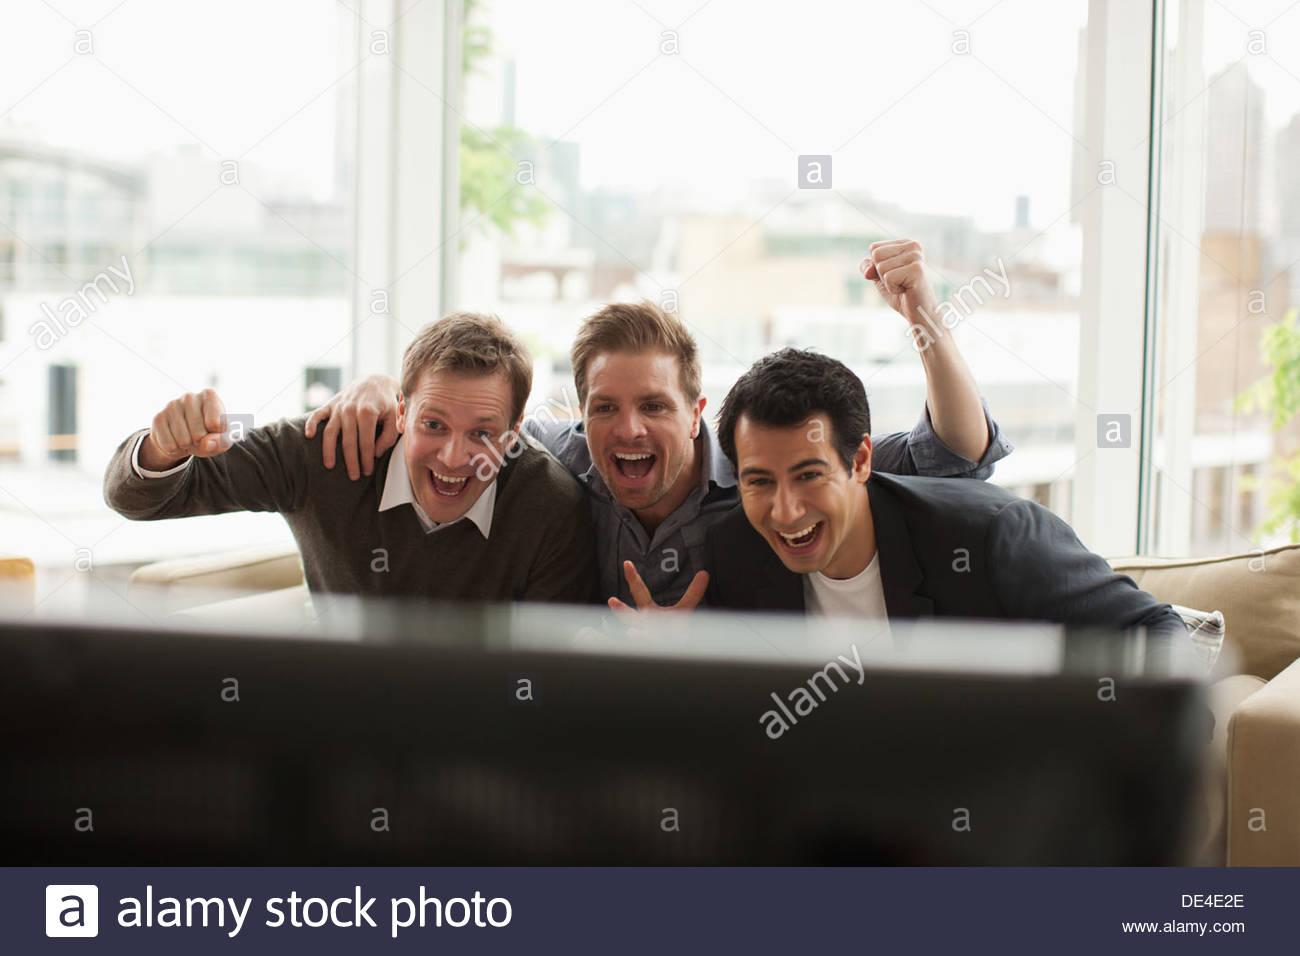 Three men watching television - Stock Image